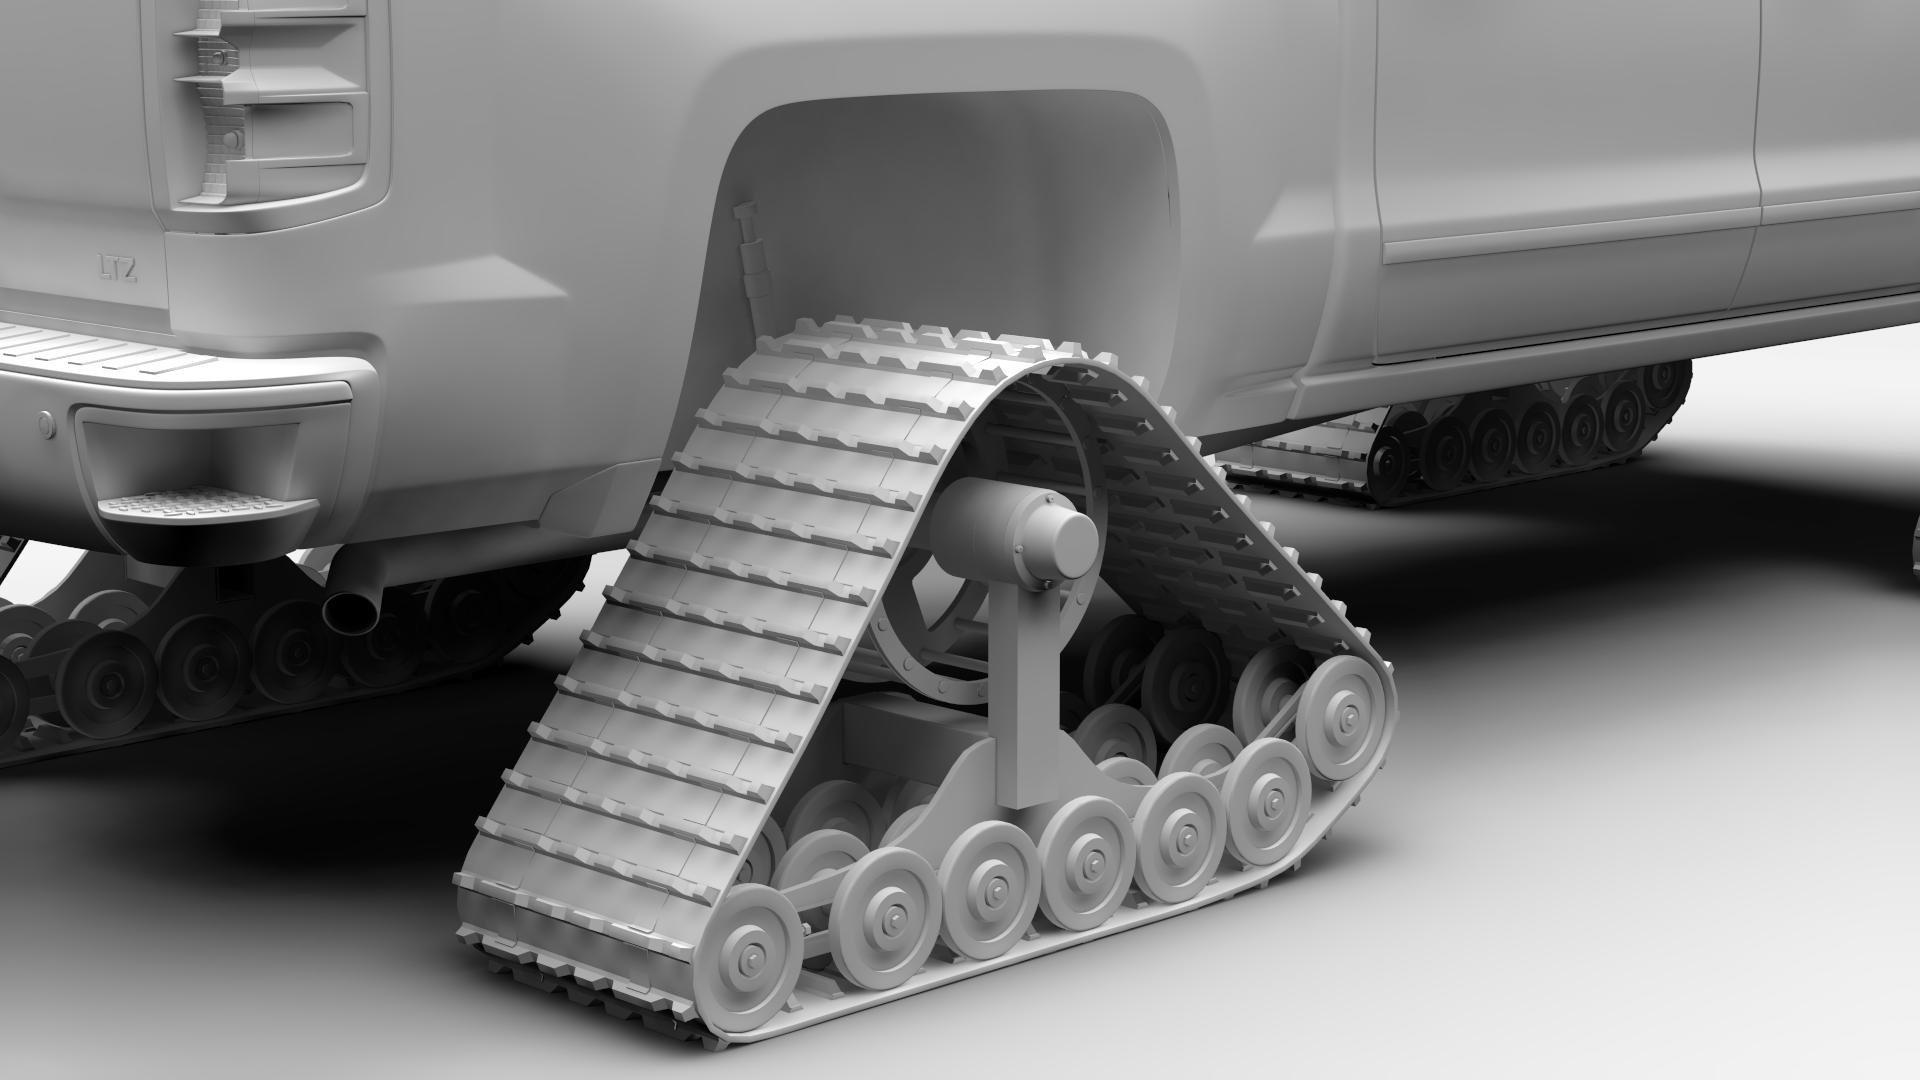 chevrolet silverado ltz z71 crawler 2017 3d model 3ds max fbx c4d lwo ma mb hrc xsi obj 221699